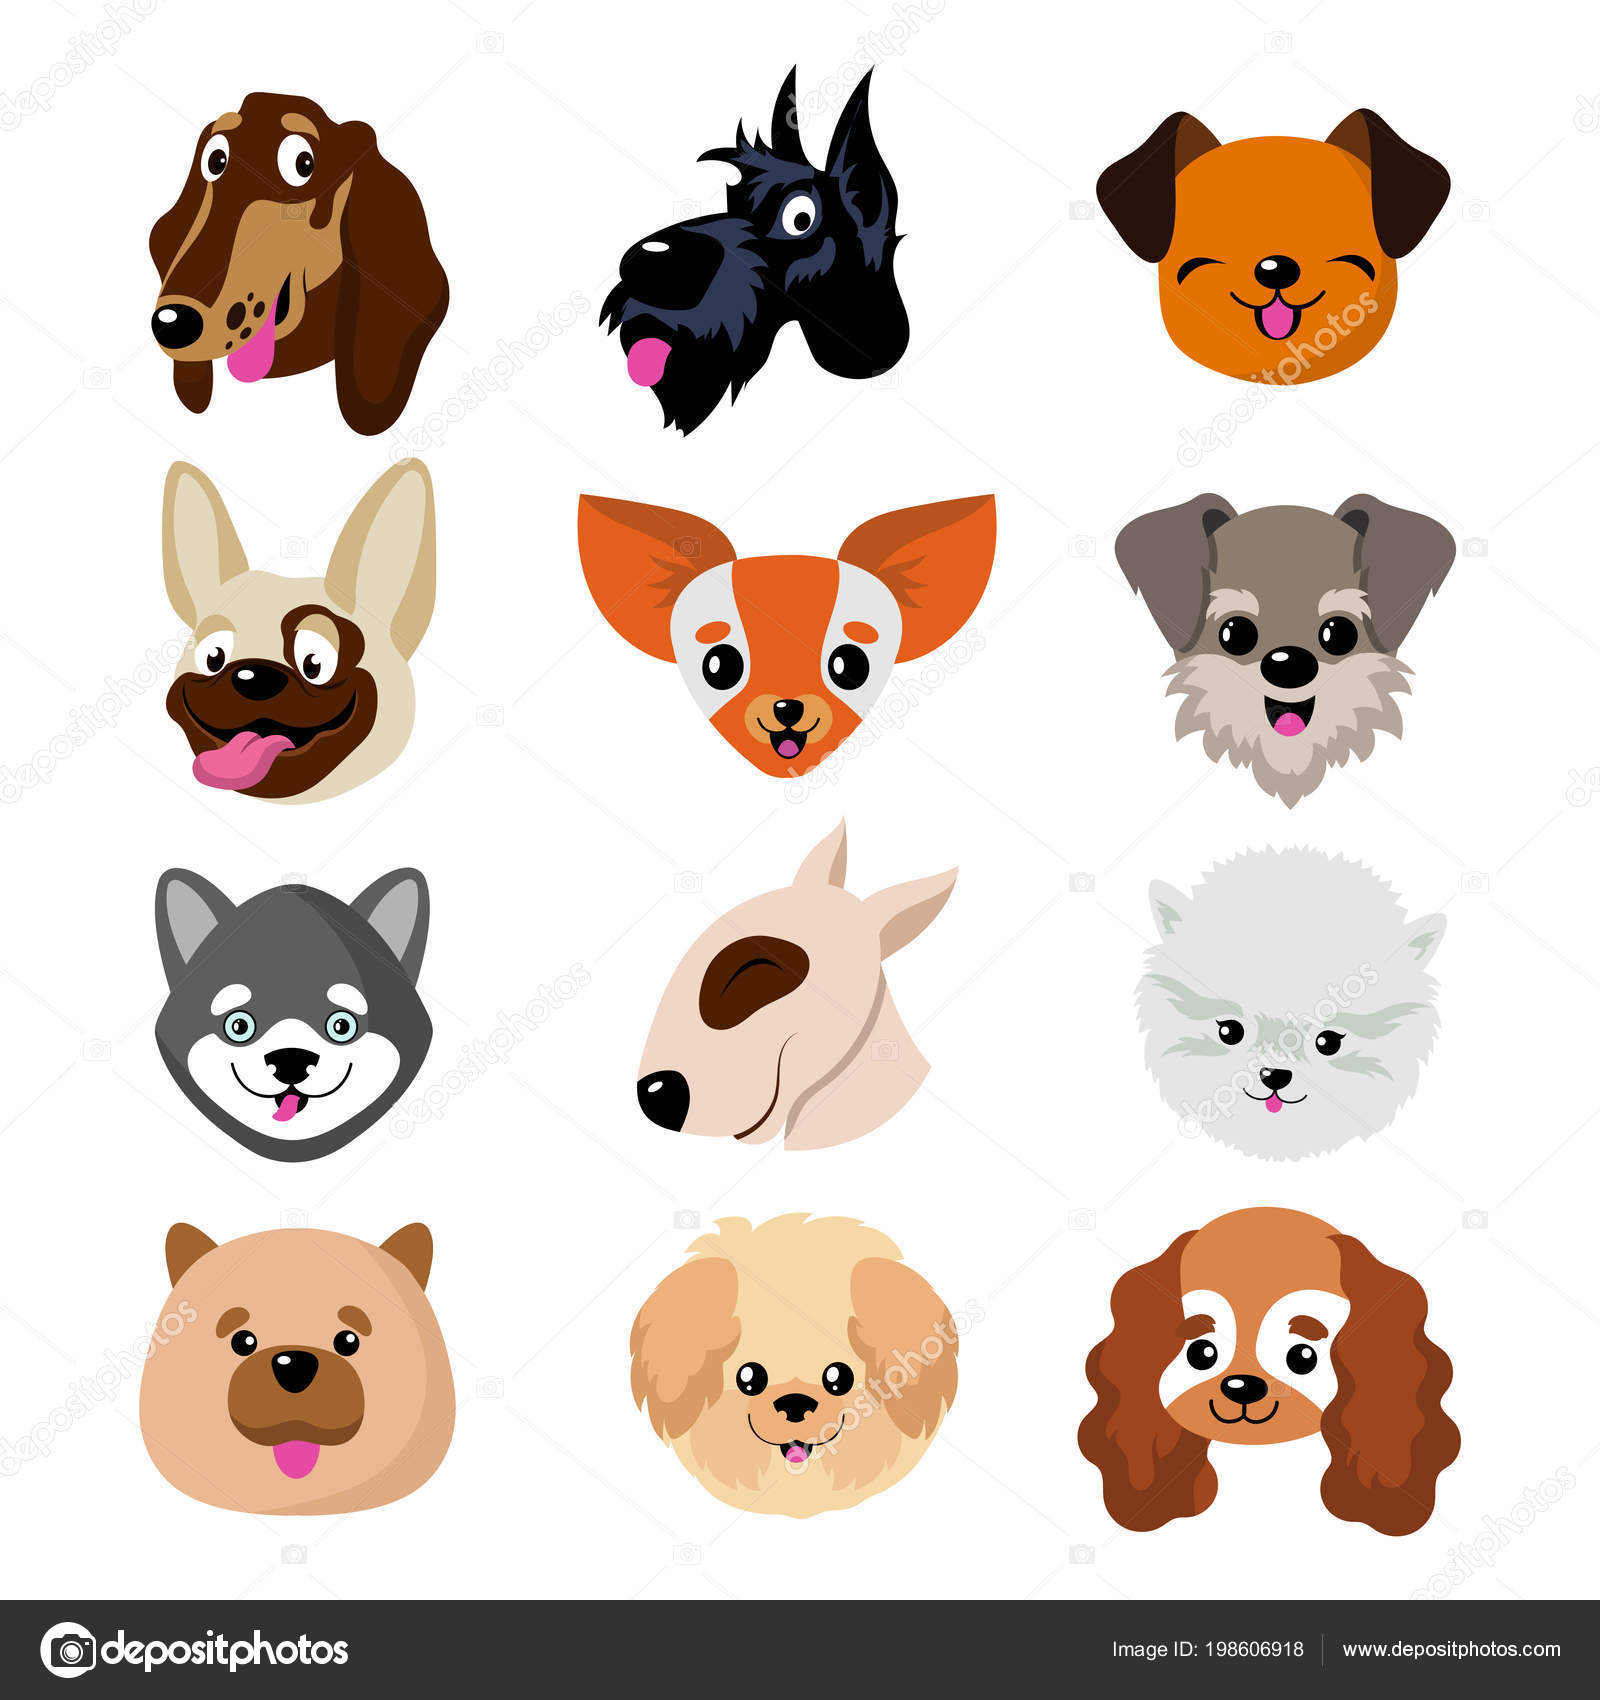 Dibujos Caras De Perro Caras De Perro De Dibujos Animados